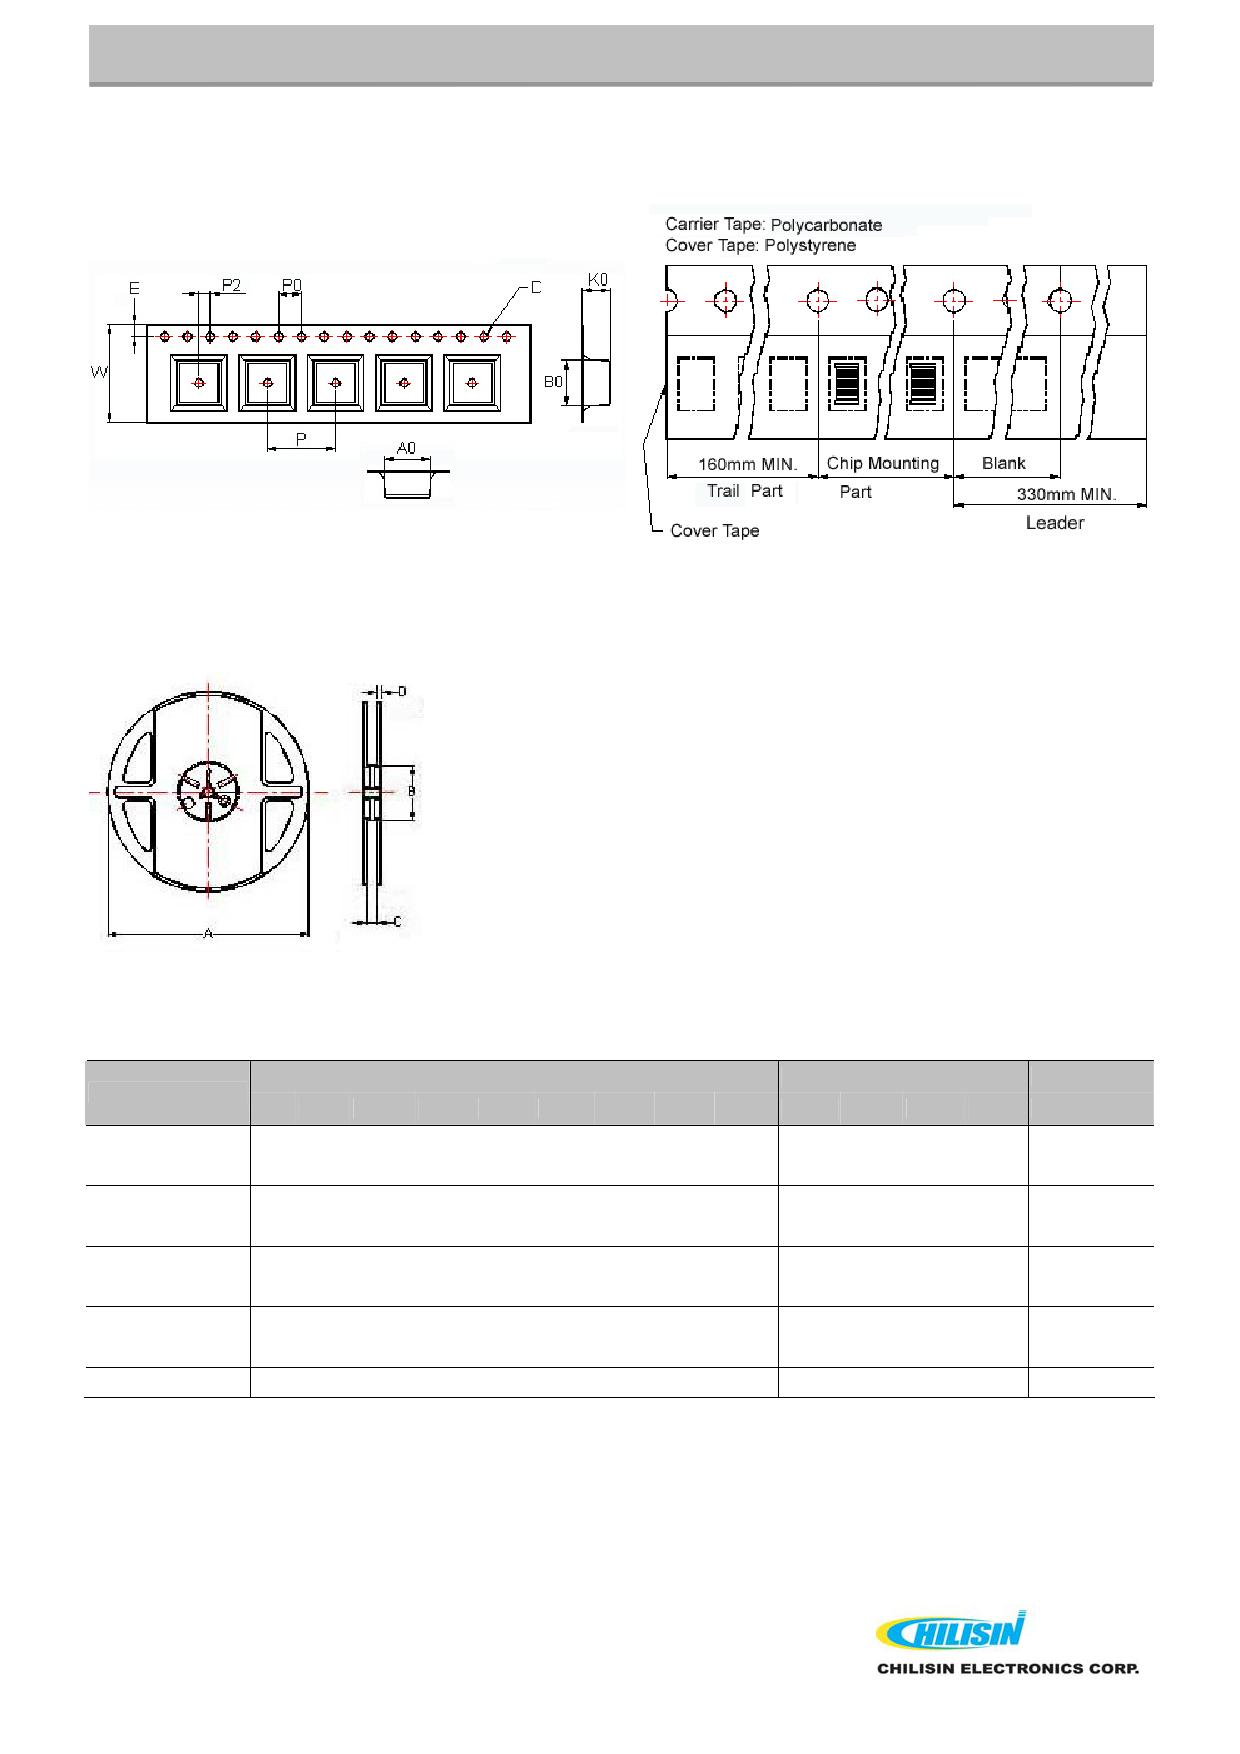 SQC575047 전자부품, 판매, 대치품